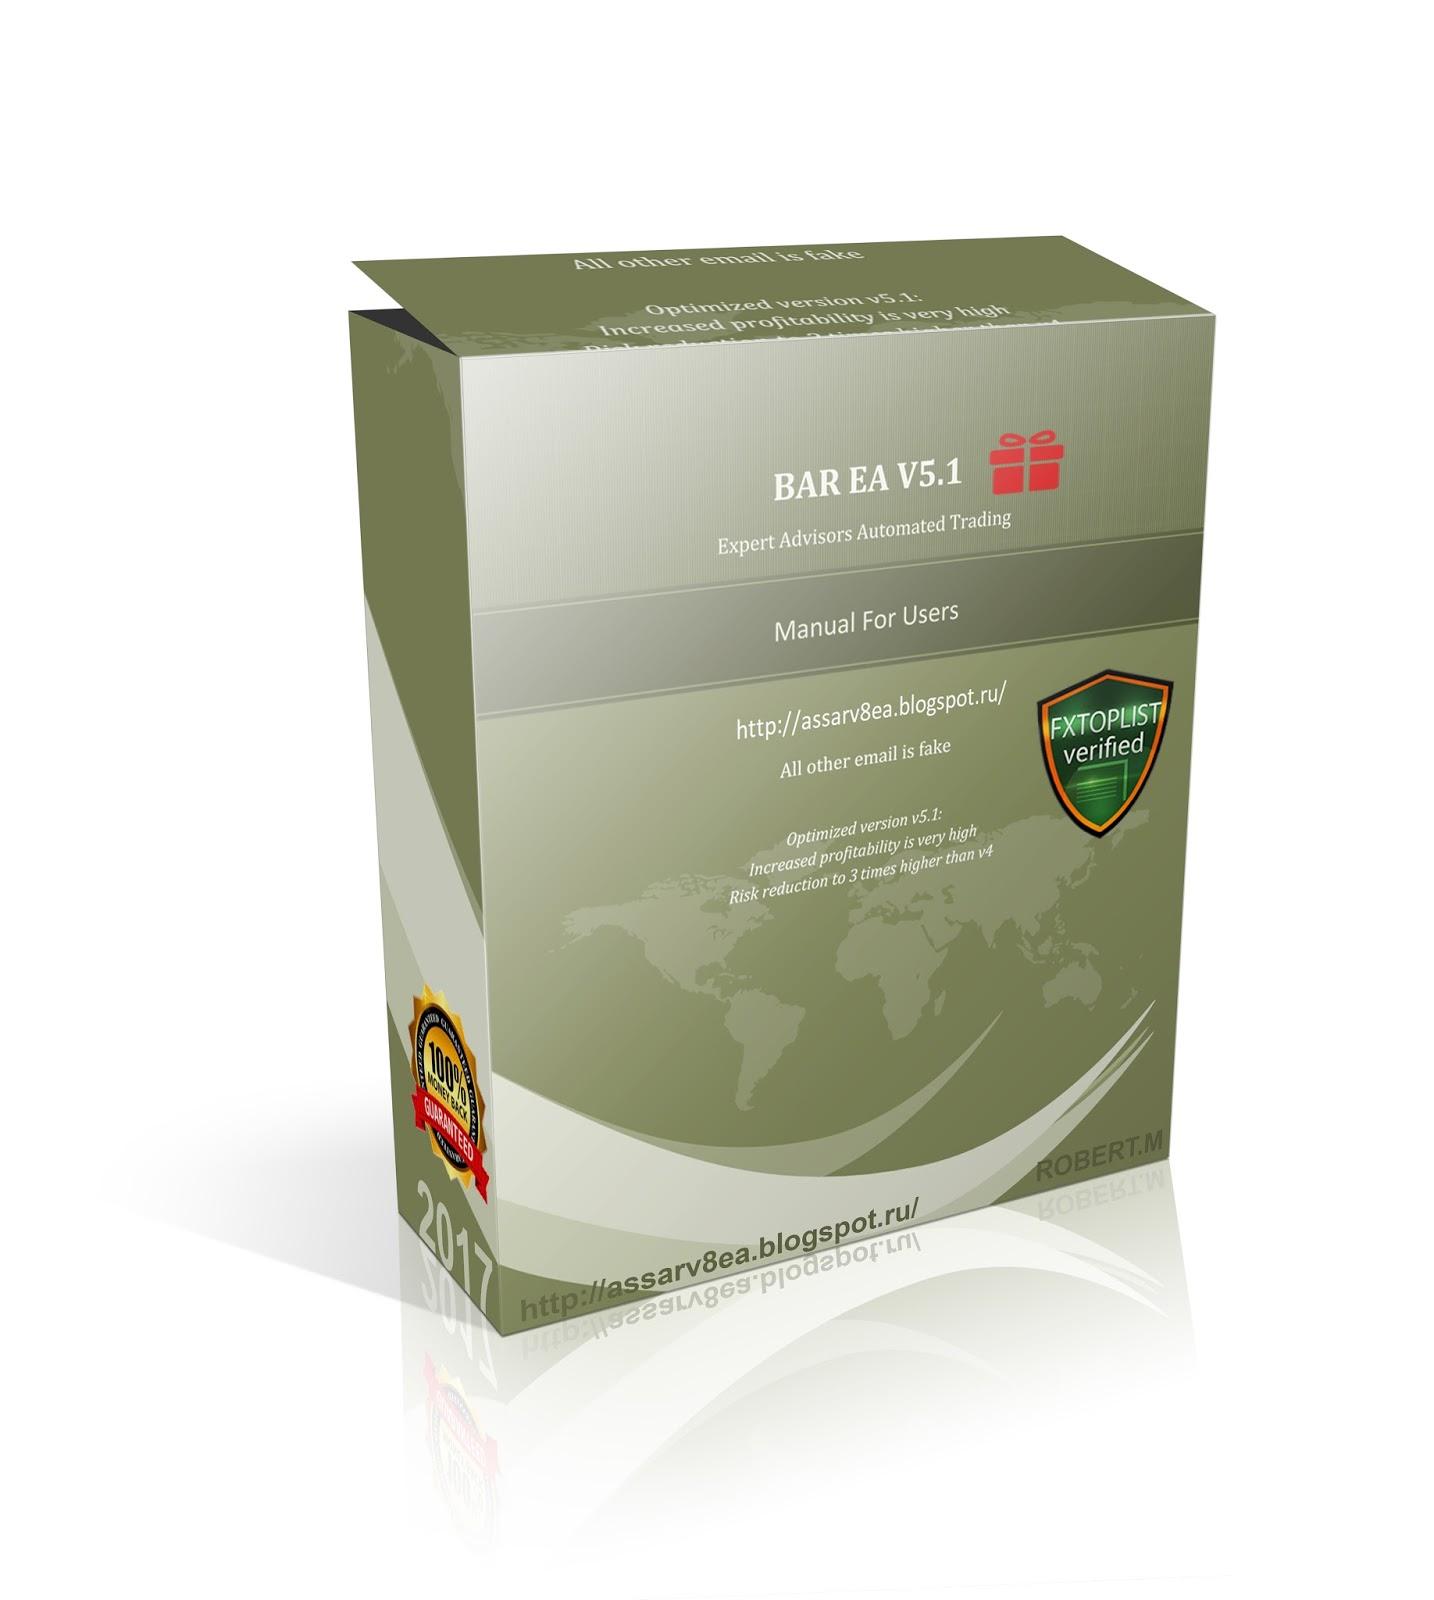 Assar elite pro forex scalper v10 free download